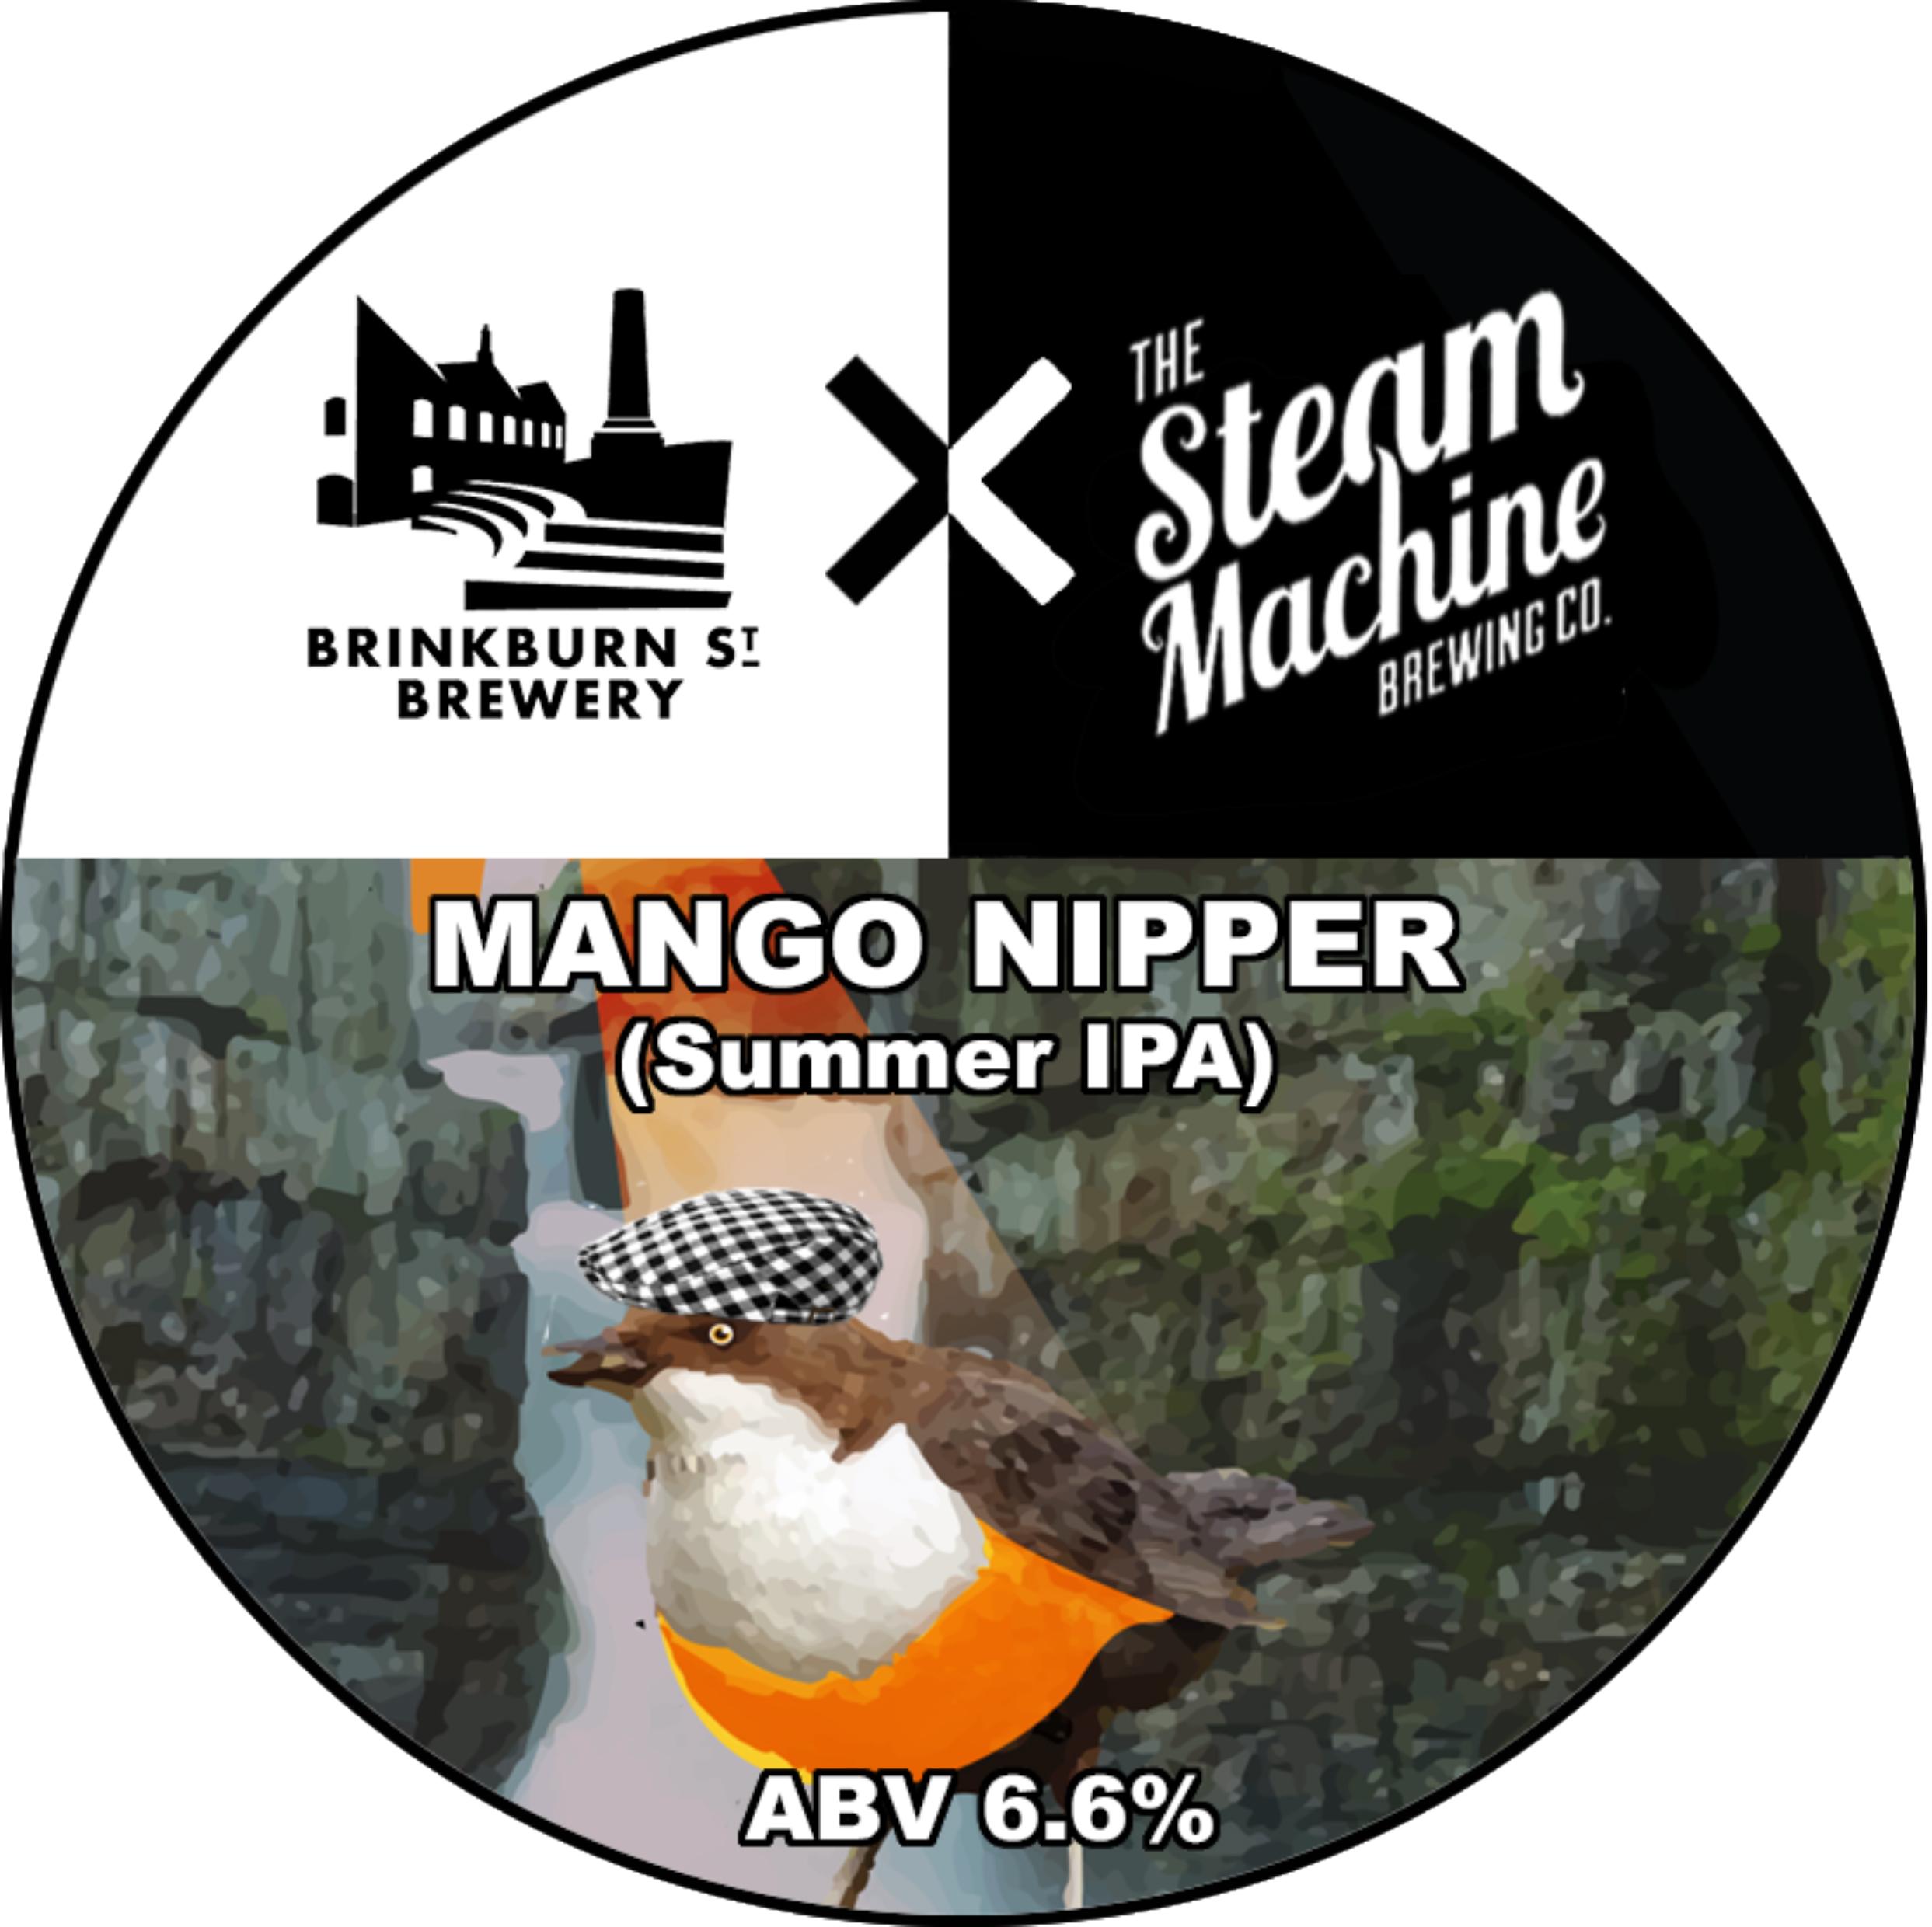 Mango Nipper Keg Clip.jpg